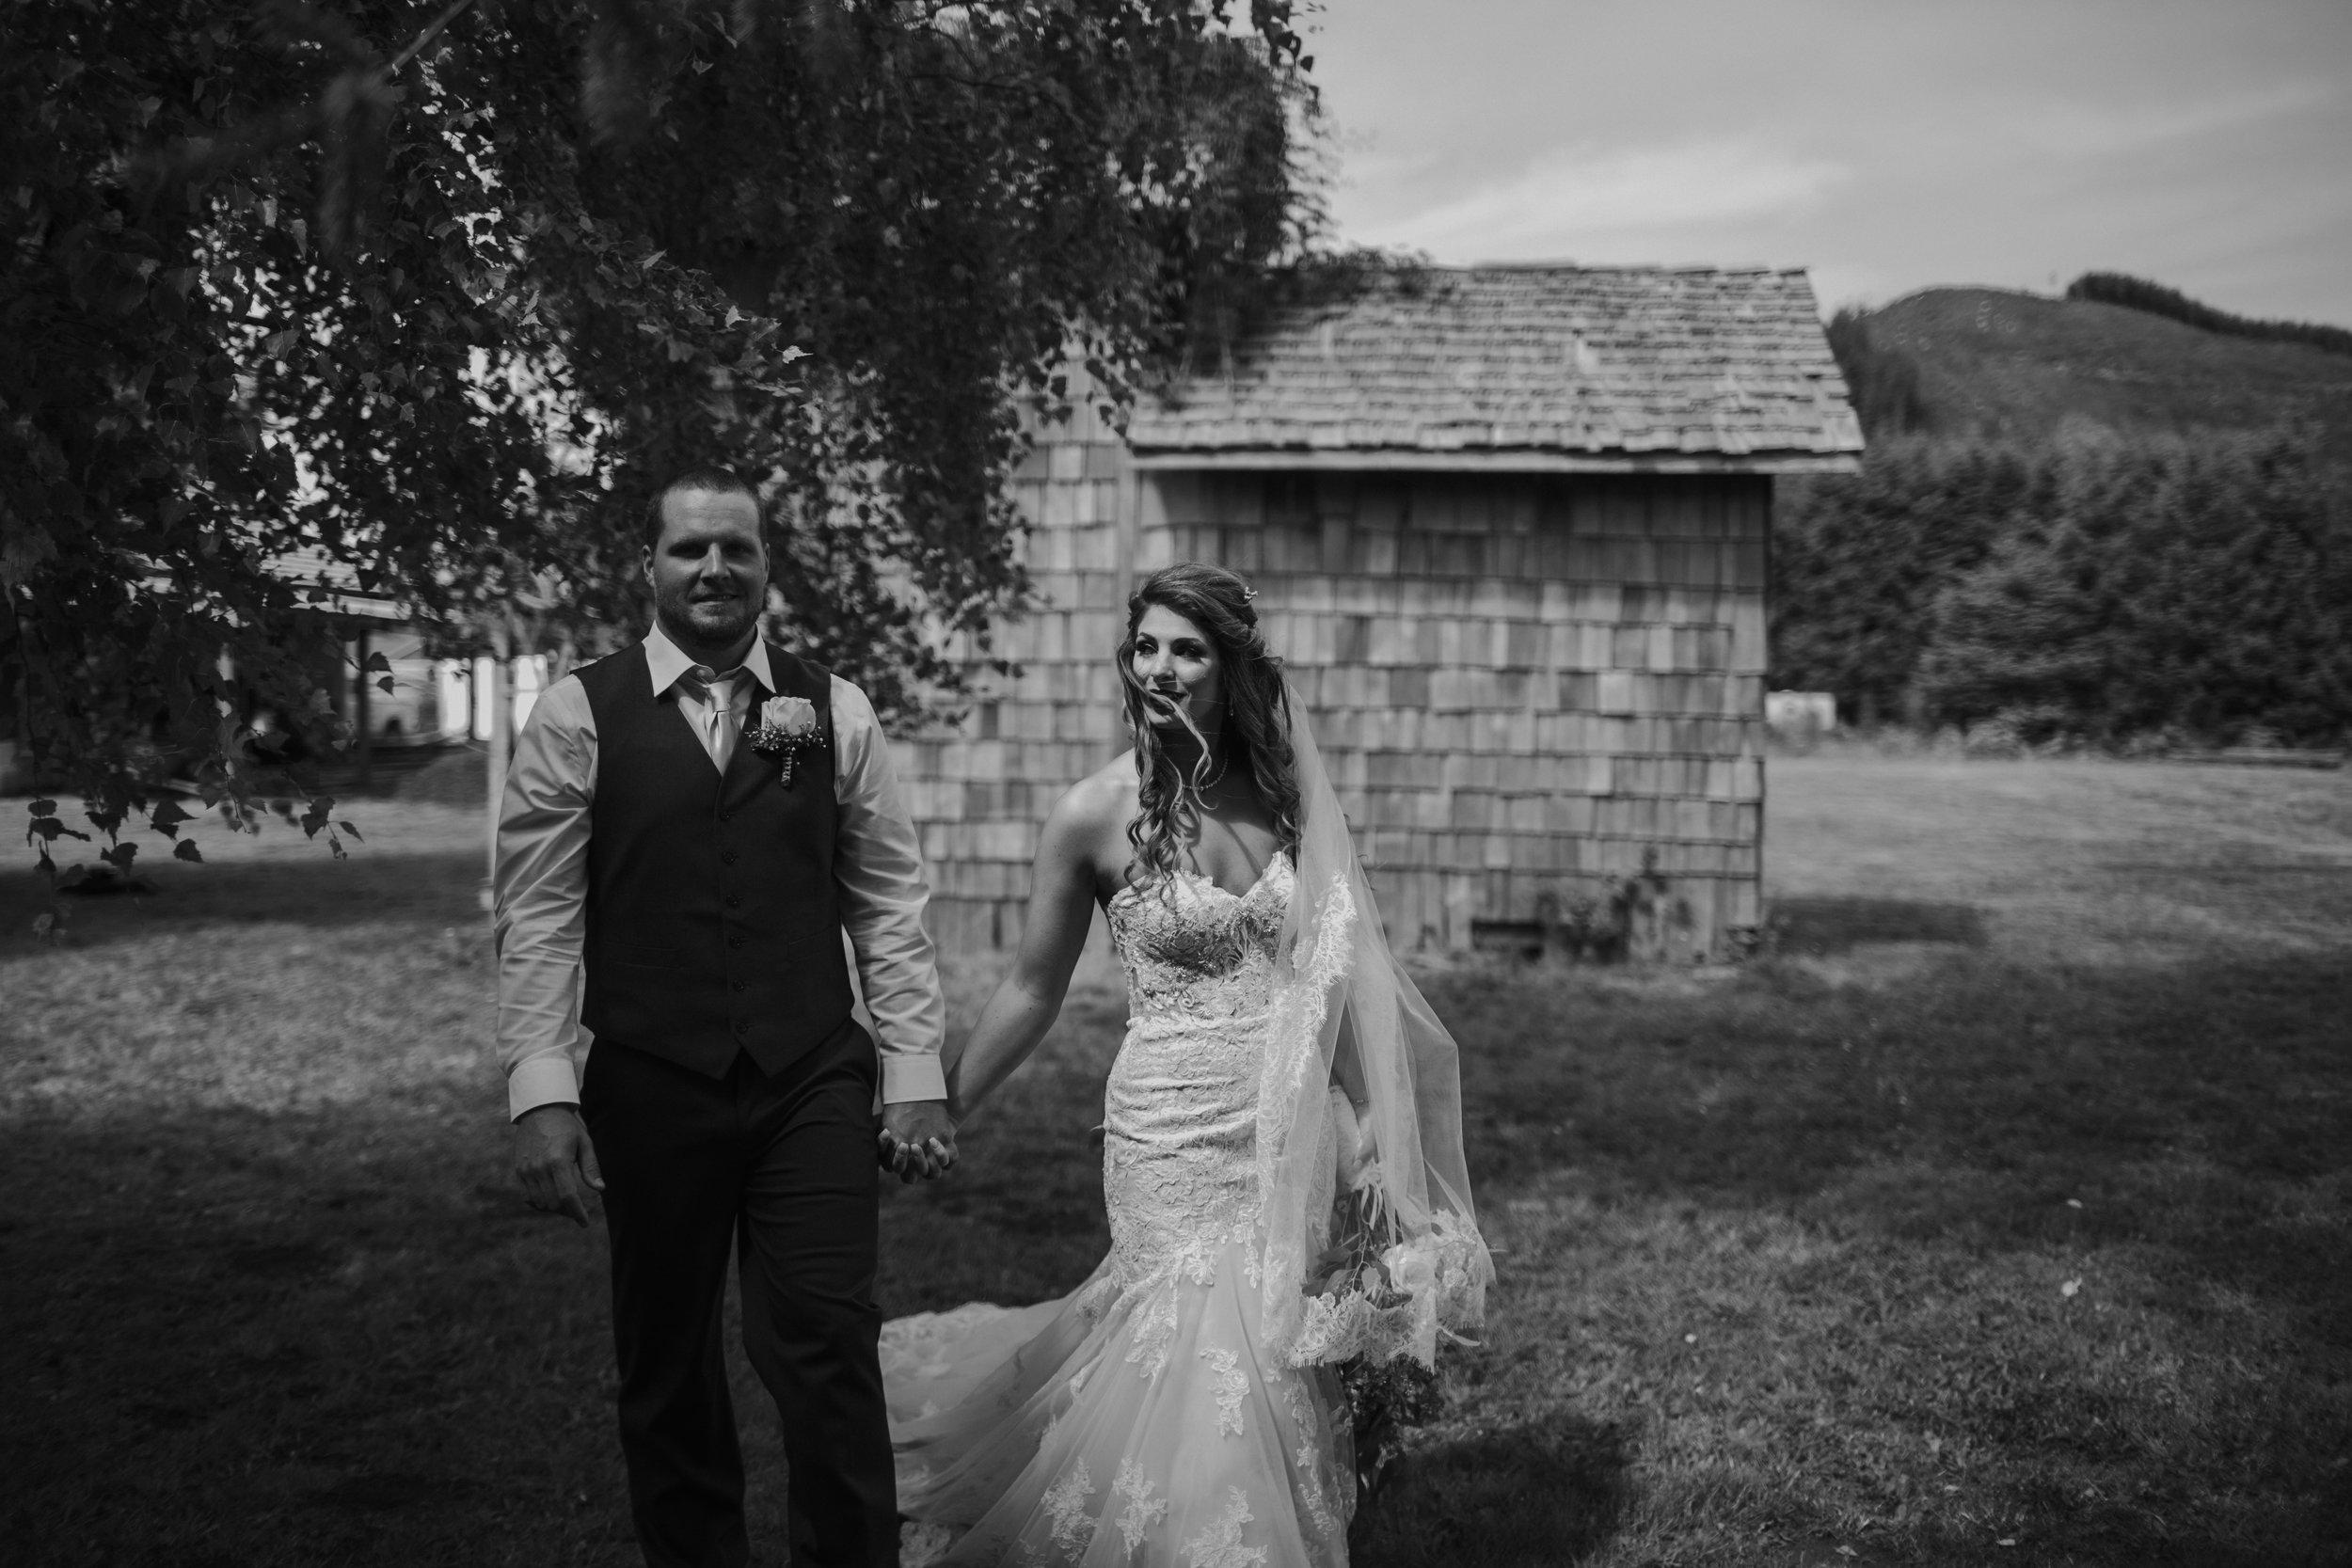 Olympic-Peninsula-Wedding-Photographer-PNW-Forks-Port-Angeles-Kayla-Dawn-Photography-engagement-Olympic-National-Park-138.jpg